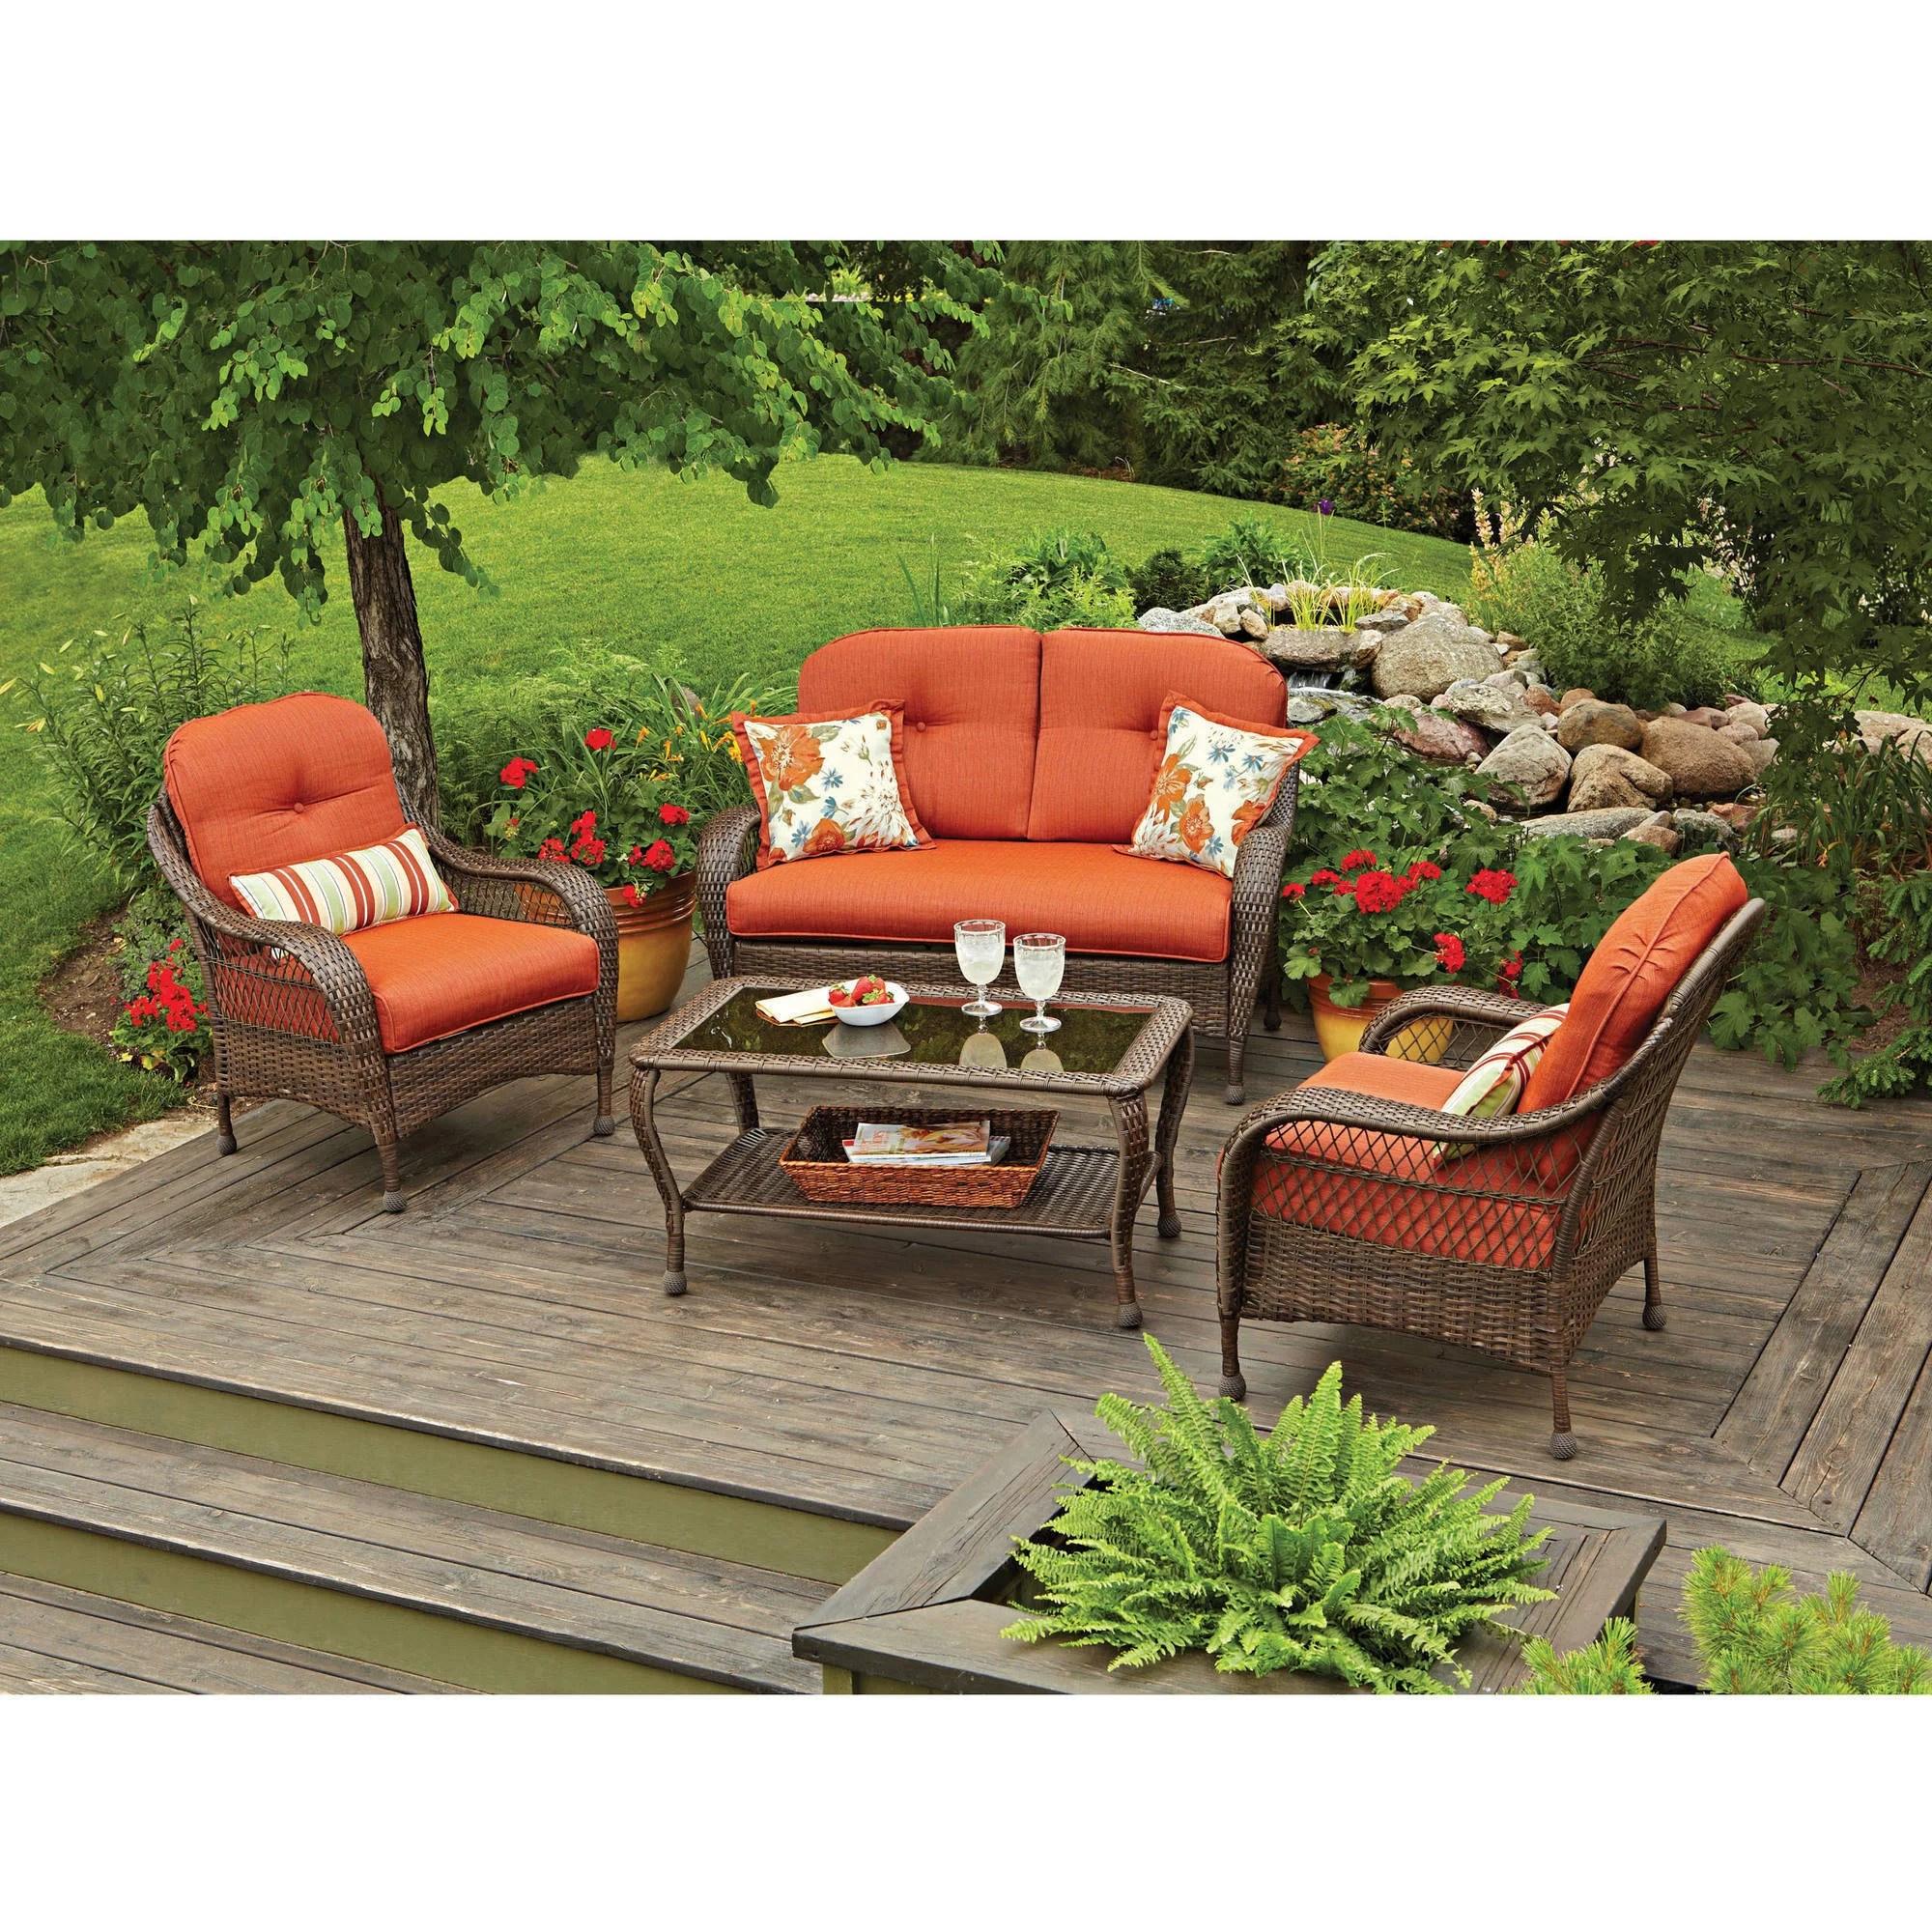 Better Homes And Gardens Azalea Ridge 4 Piece Patio - Walmart Outdoor Patio Furniture